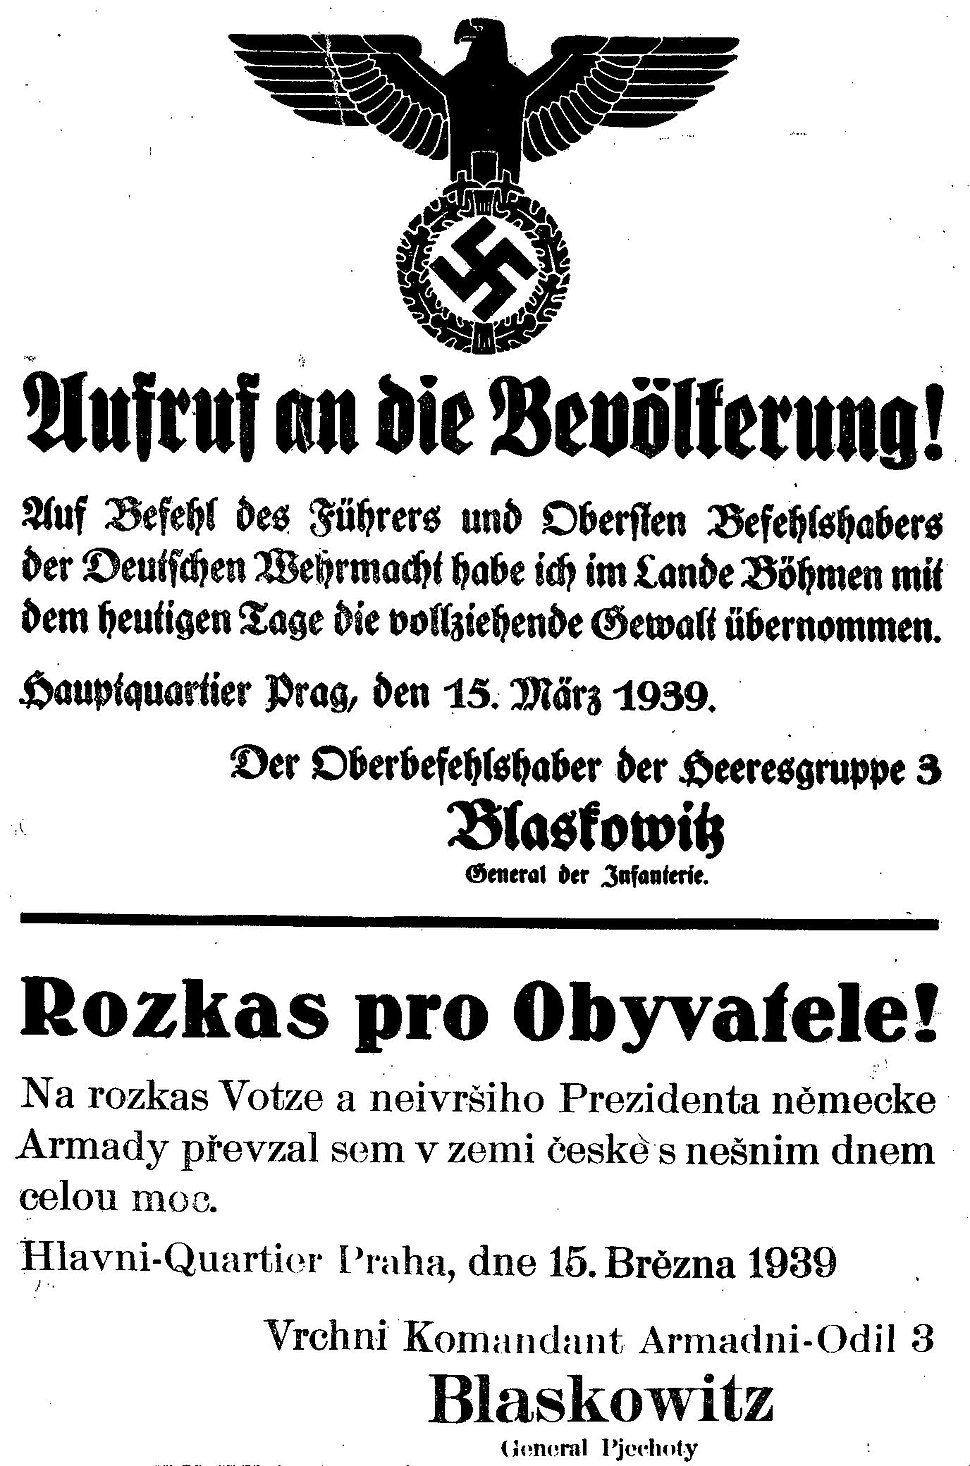 Poster Protektor%C3%A1t - Rozkas pro obyvatele 1939 (01)